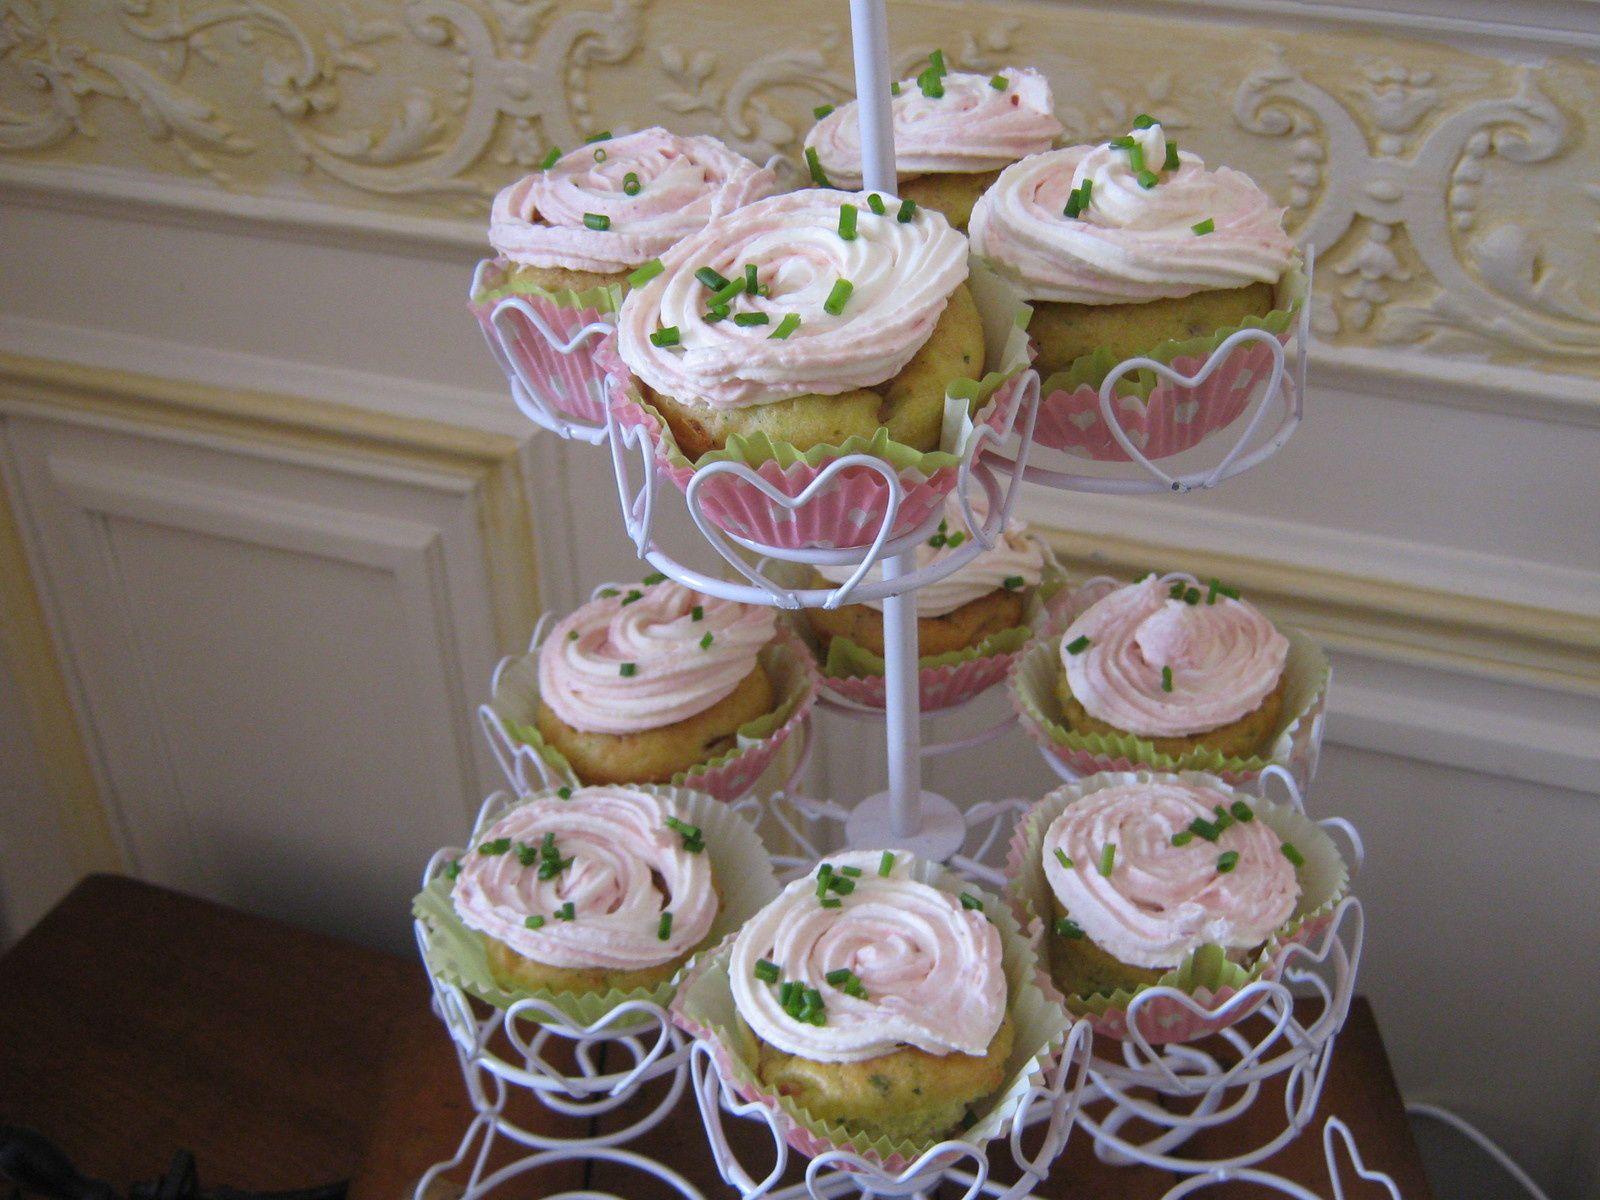 cupcakes salés &quot&#x3B;bouquet de roses&quot&#x3B;